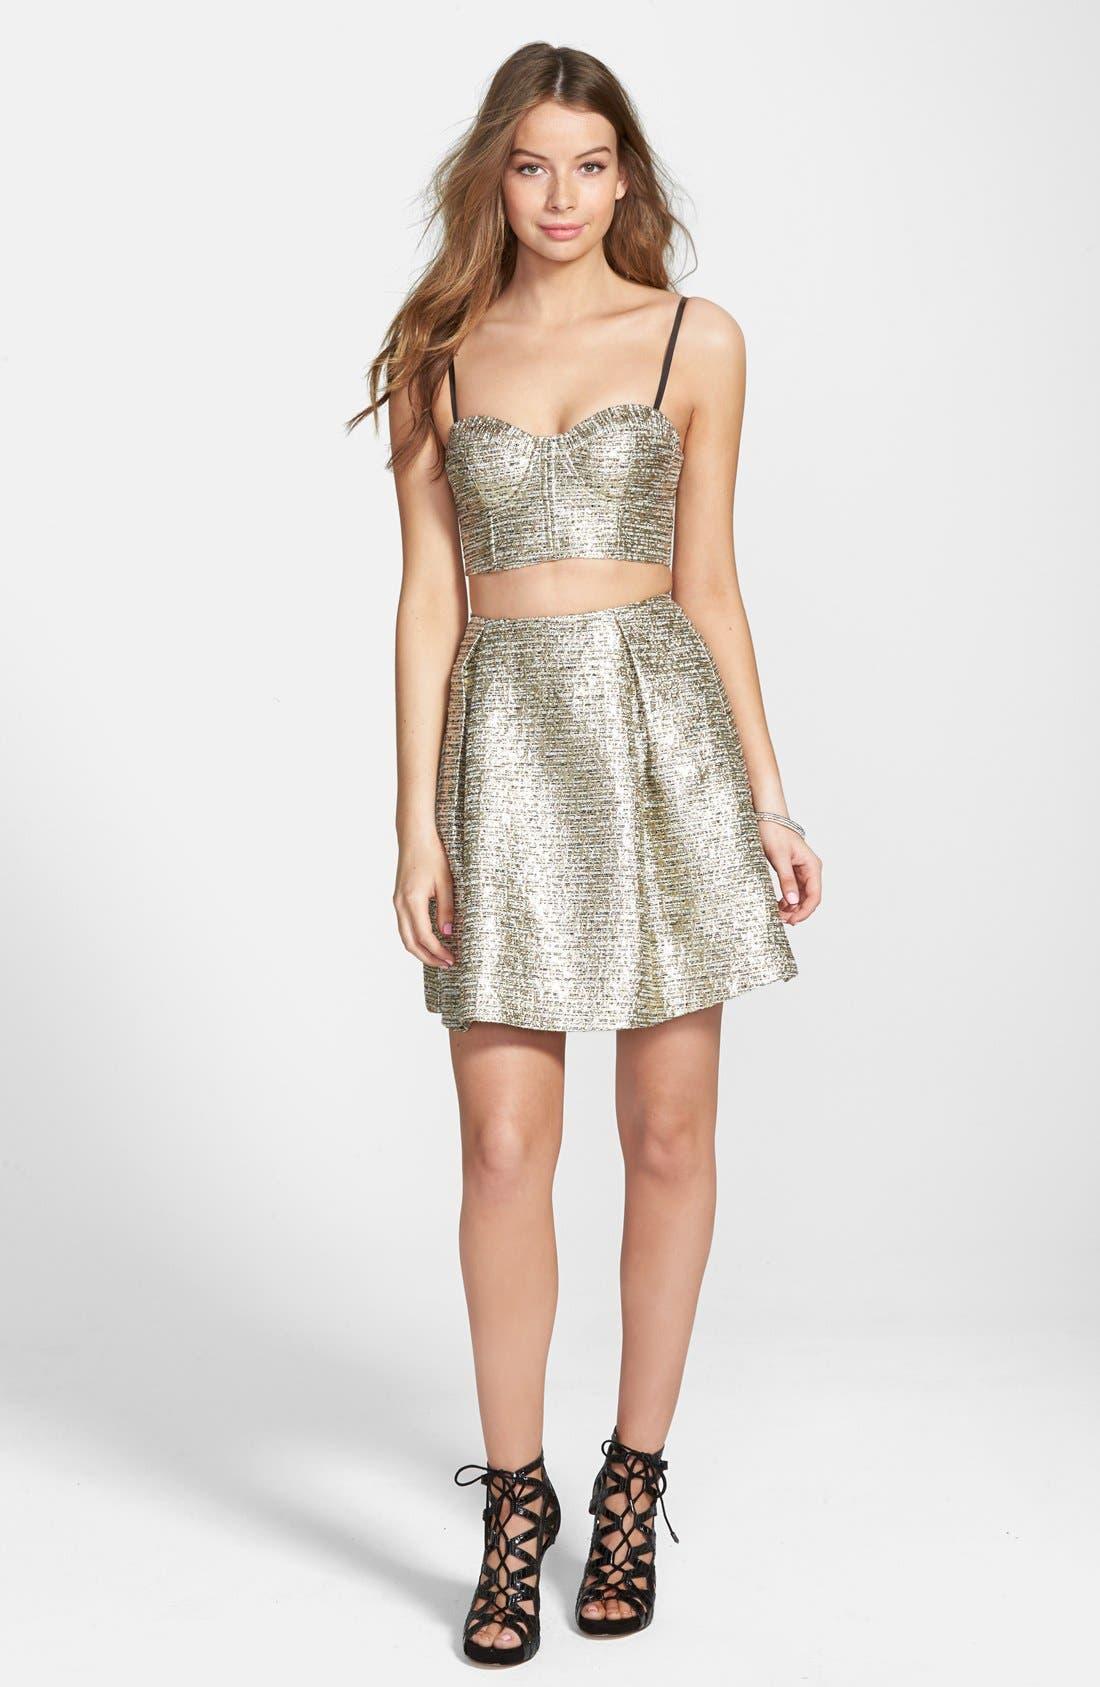 Main Image - a. drea 'Maddie' Textured Metallic Two-Piece Dress (Juniors)